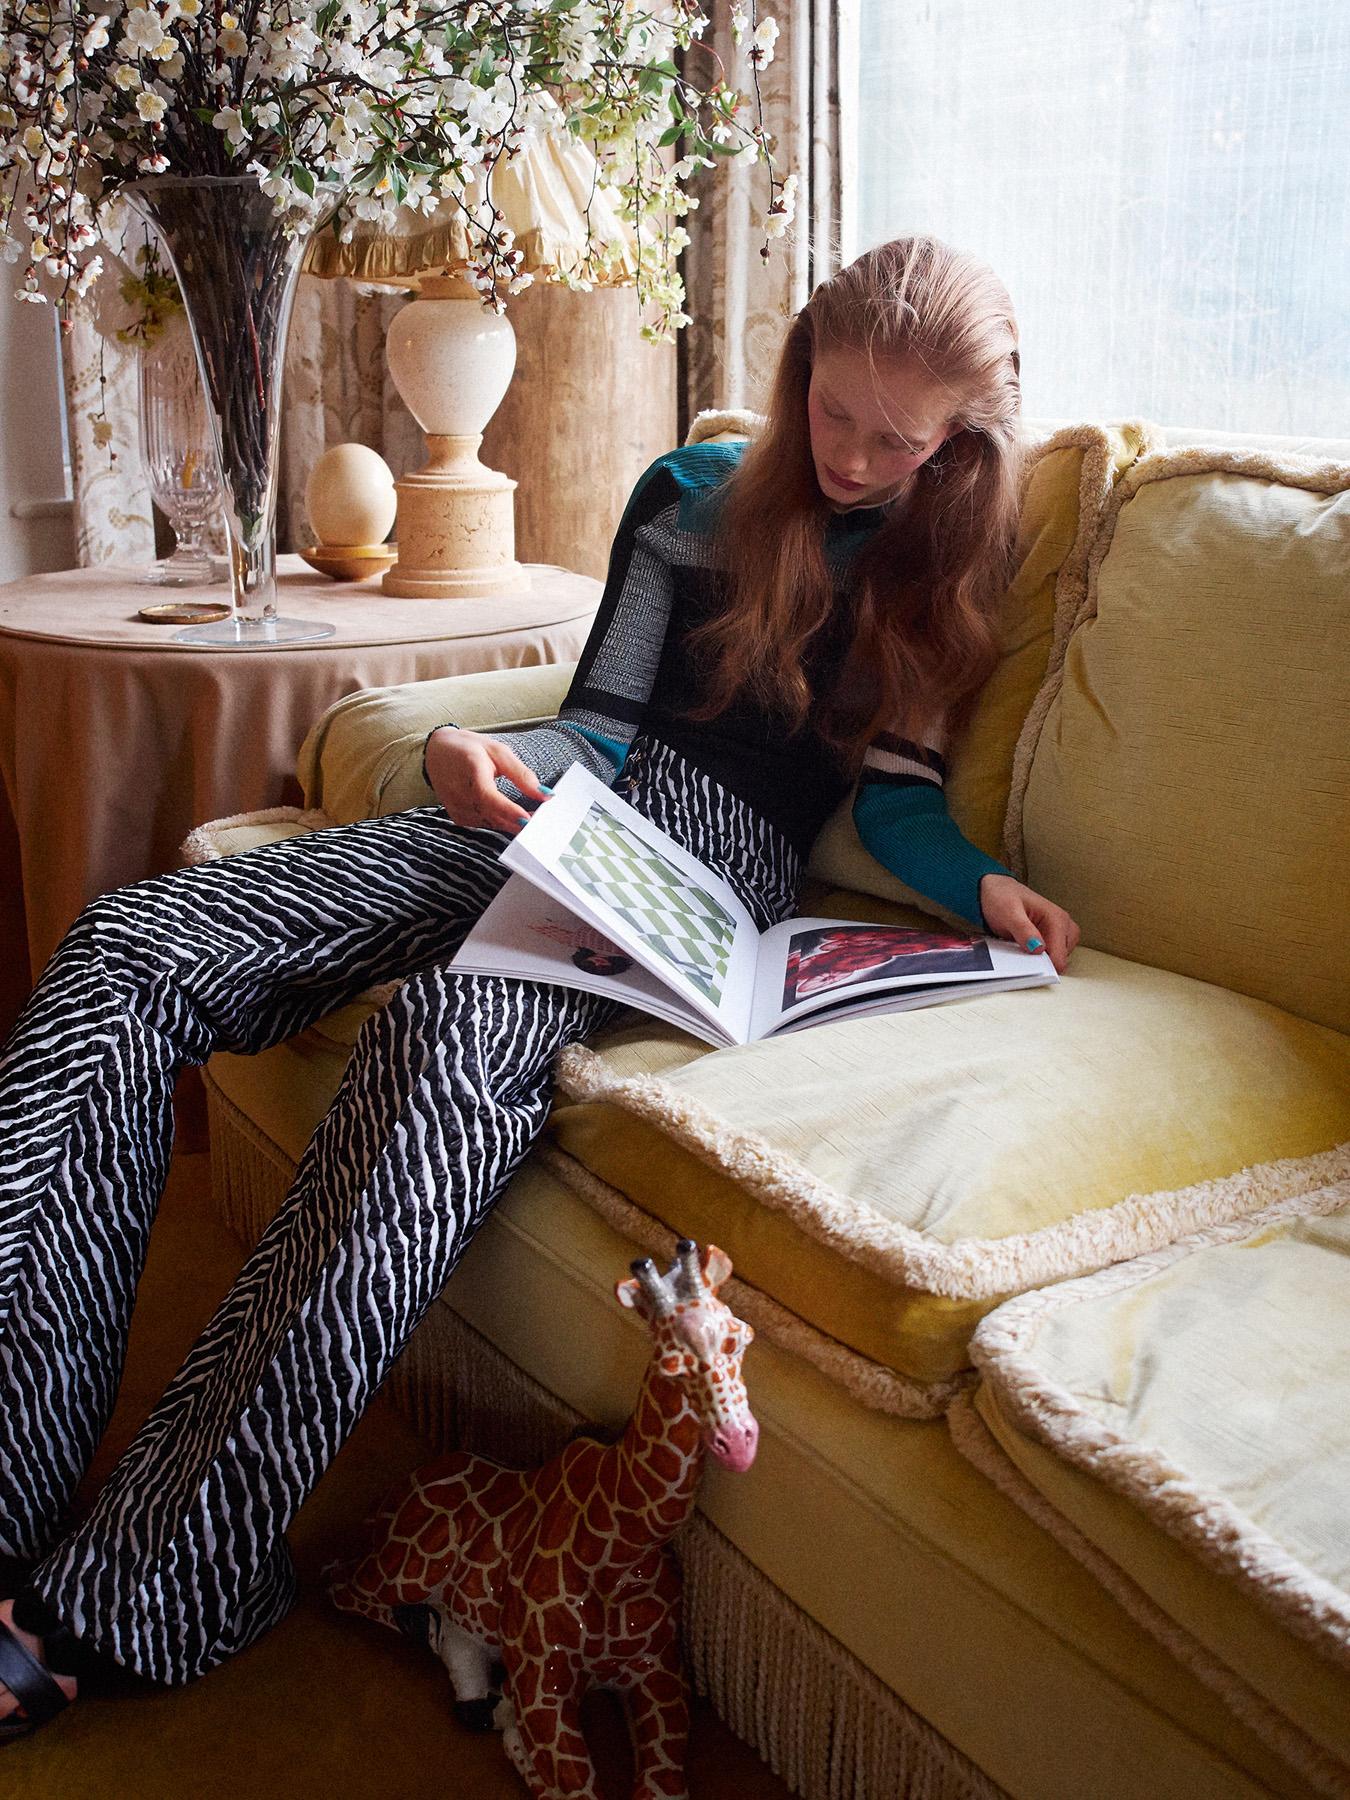 190-icon-artist-management-Kristin-Vicari-Fashion-please13.jpg